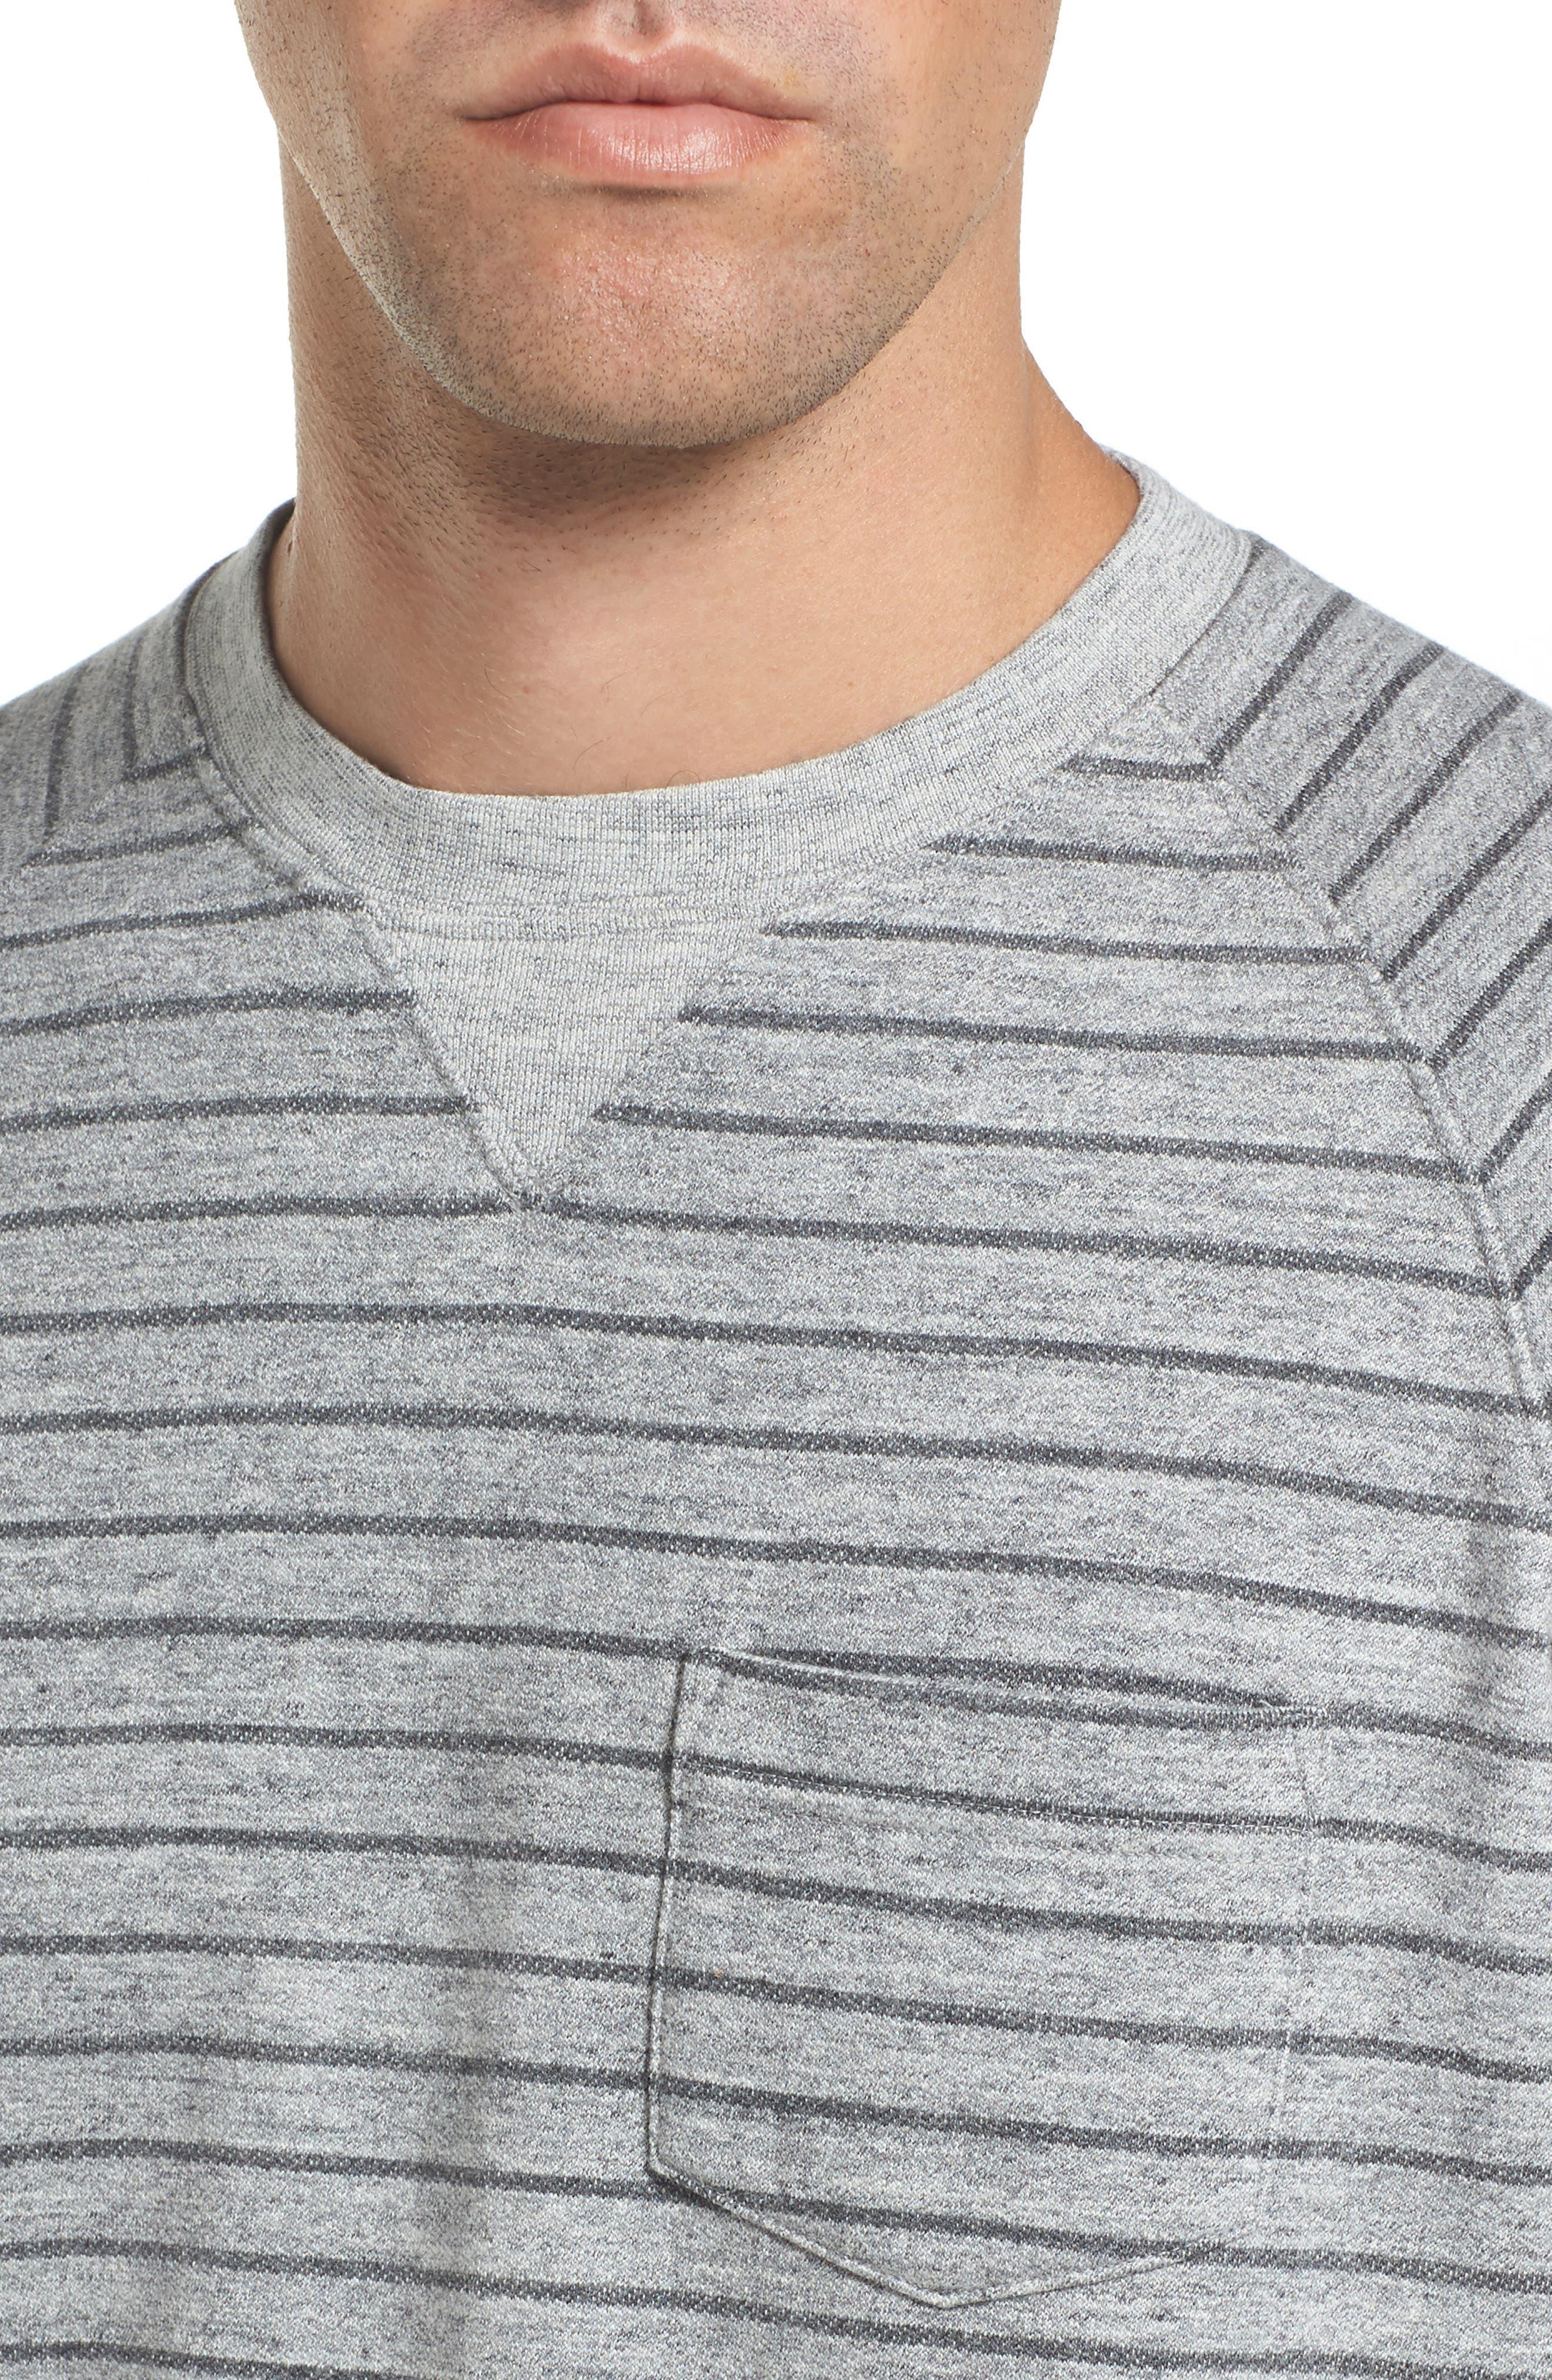 Palmer Modern Fit Athletic Stripe Sweatshirt,                             Alternate thumbnail 6, color,                             Gray Heather / Charcoal